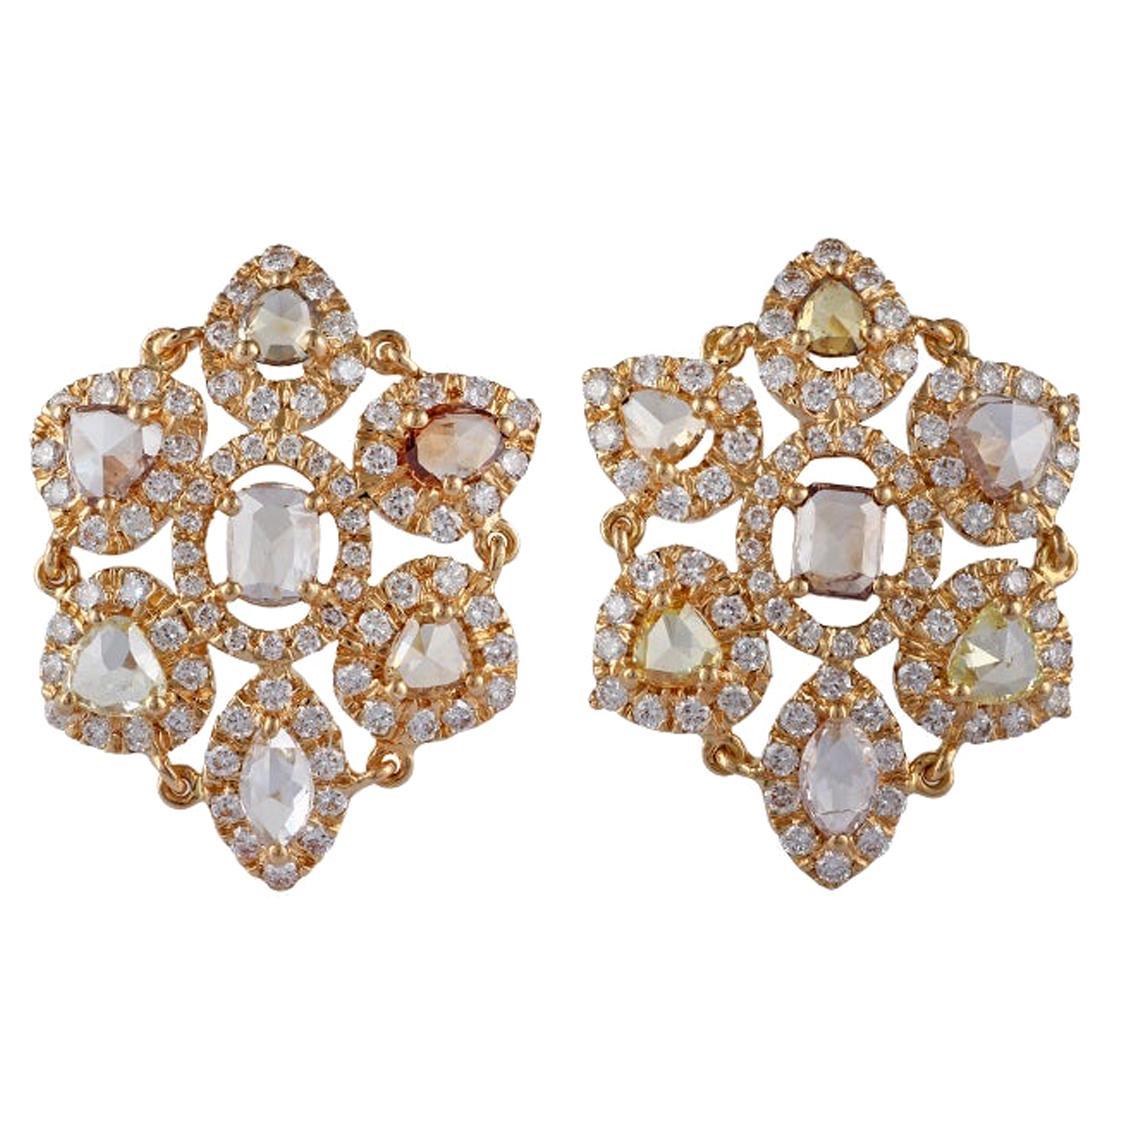 Yellow Diamond Earrings Studded in 18 Karat Yellow Gold